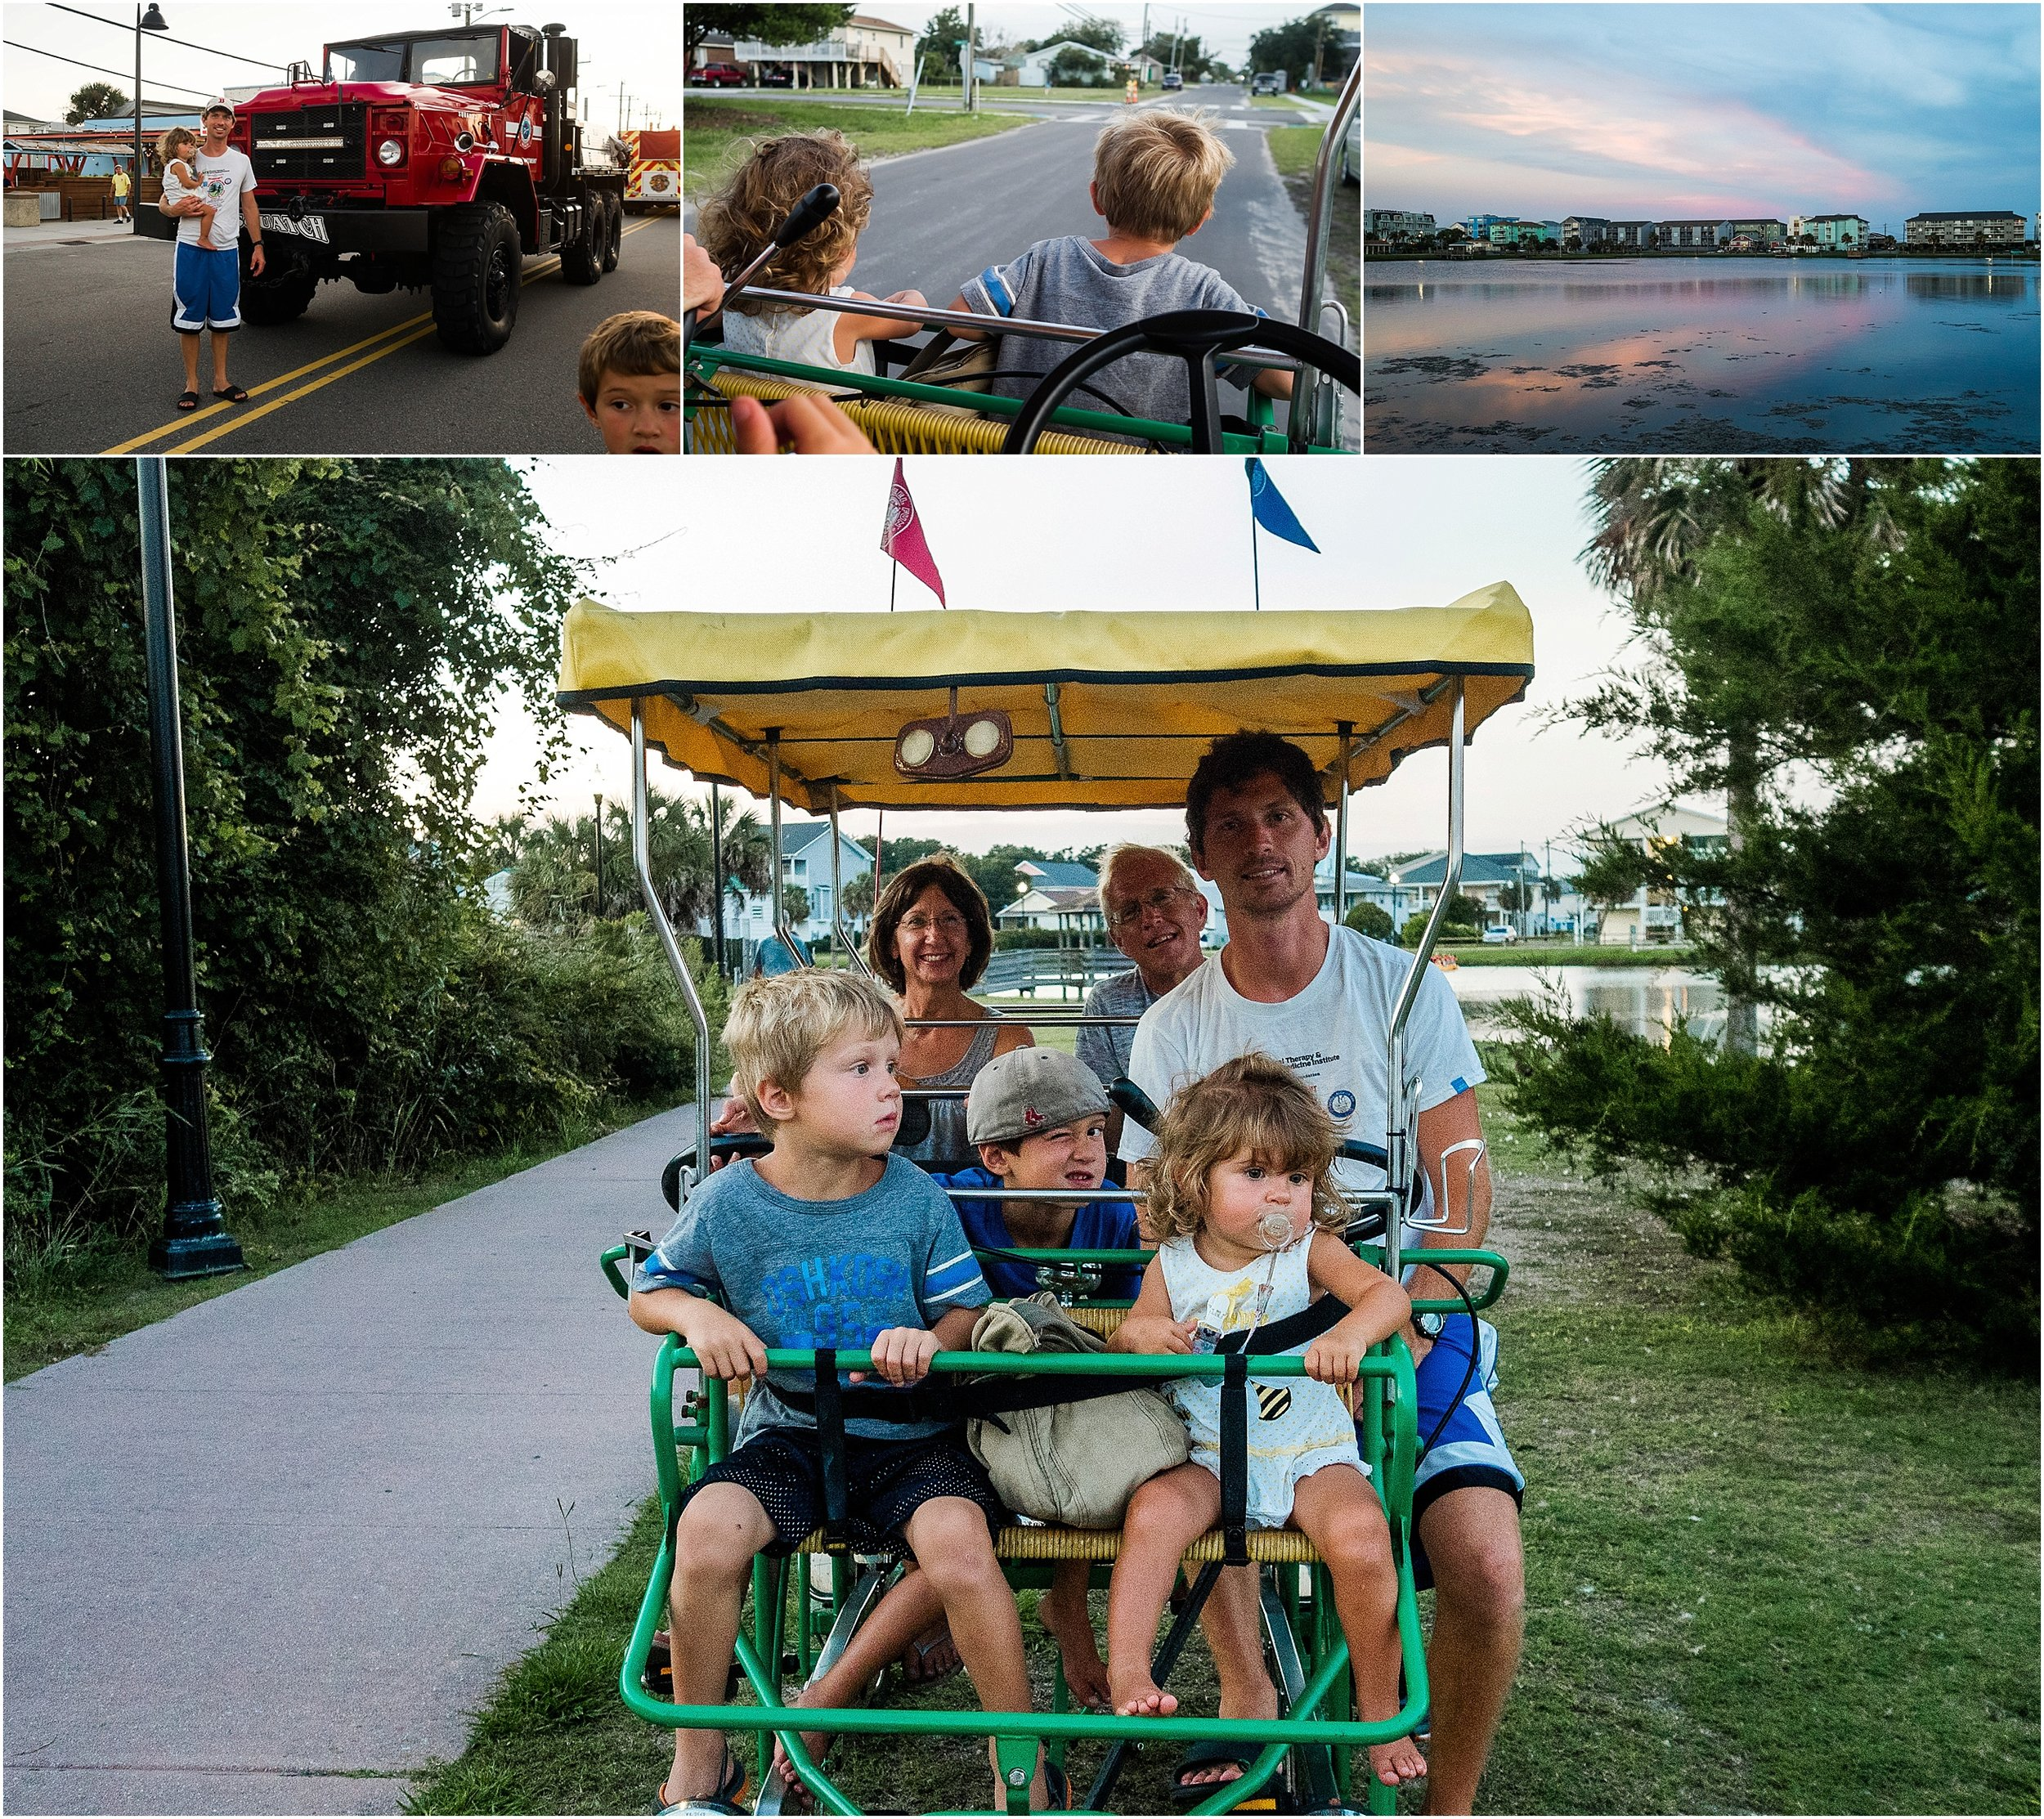 family on vacation riding surrey bike Carolina Kure Beach